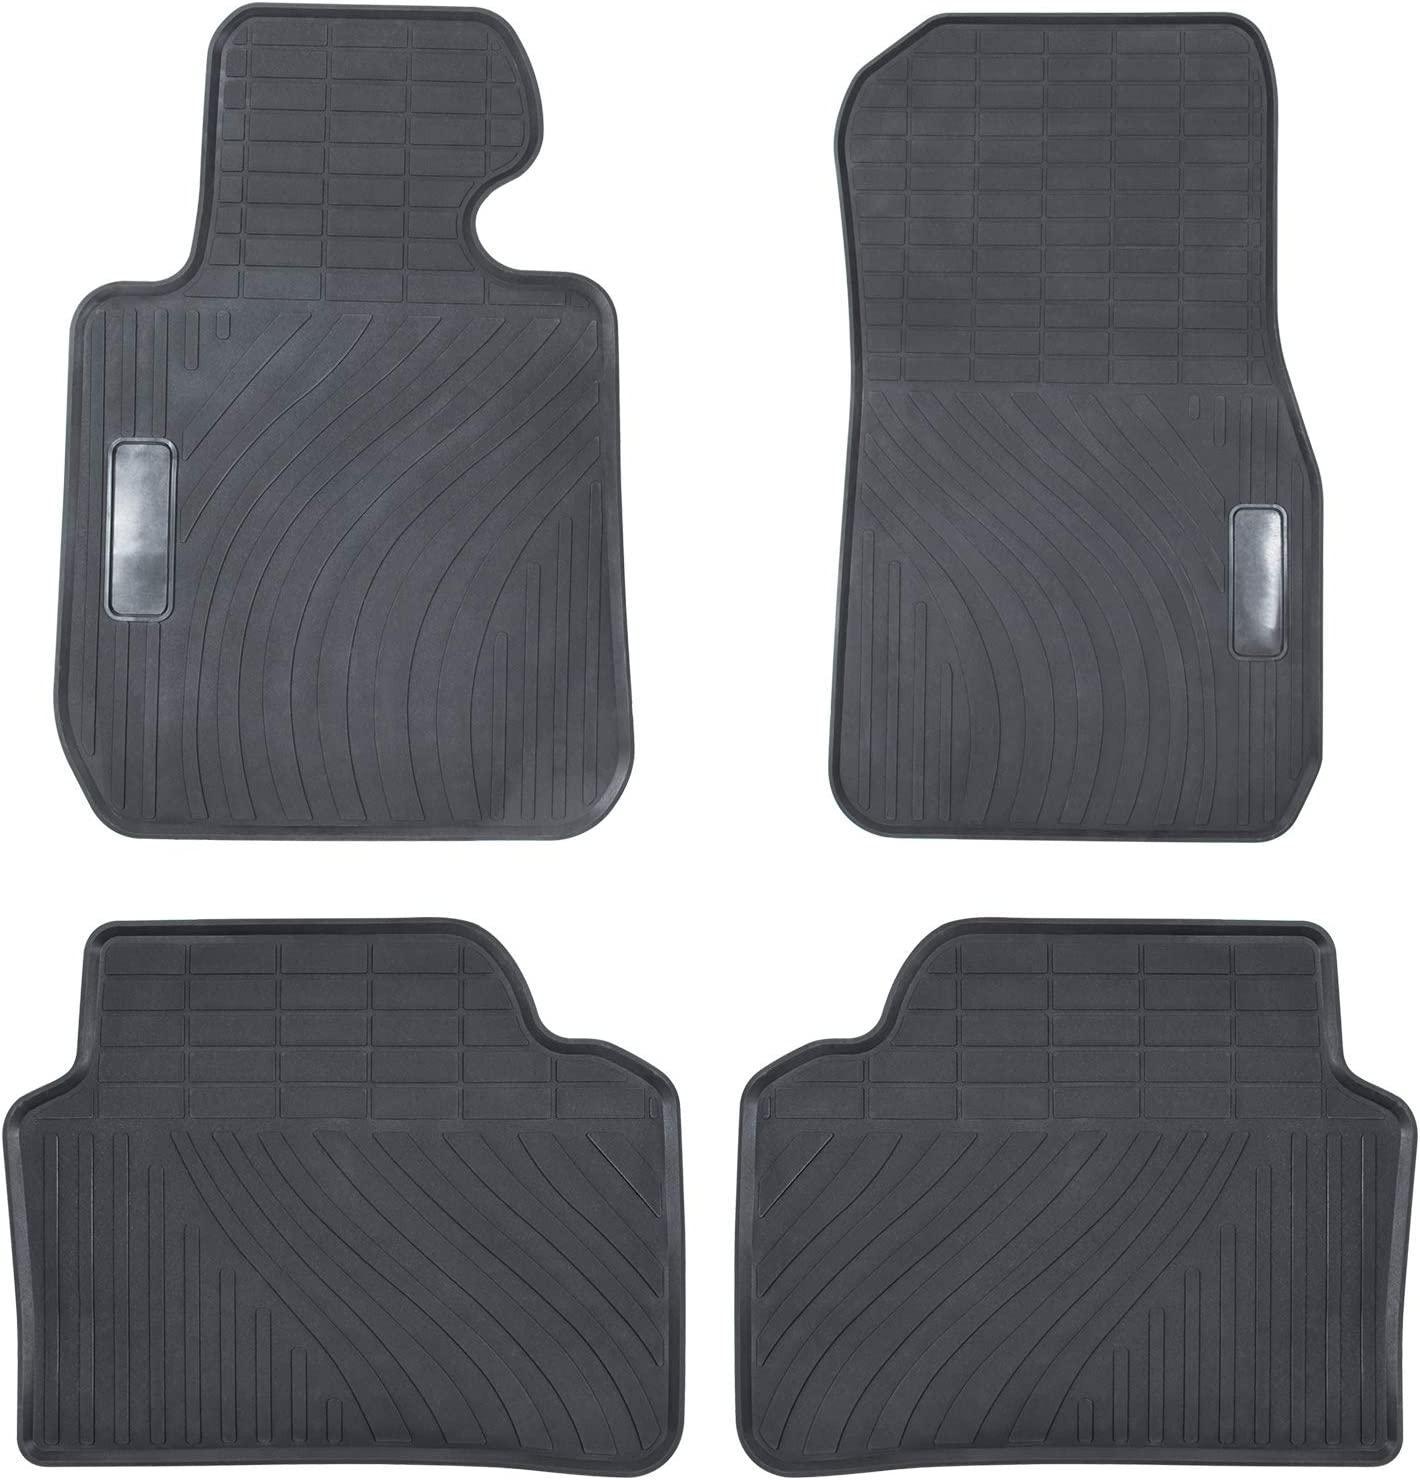 Black 4PCS F80 M3 Heavy Duty Rubber Front+Rear Car Liner Carpet All Weather Custom Fit Waterproof Odorless Floor Mat for BMW 3 Series F30 F31 F32 F33 F36 320i 328i 335i 2012-2018 /& 2015